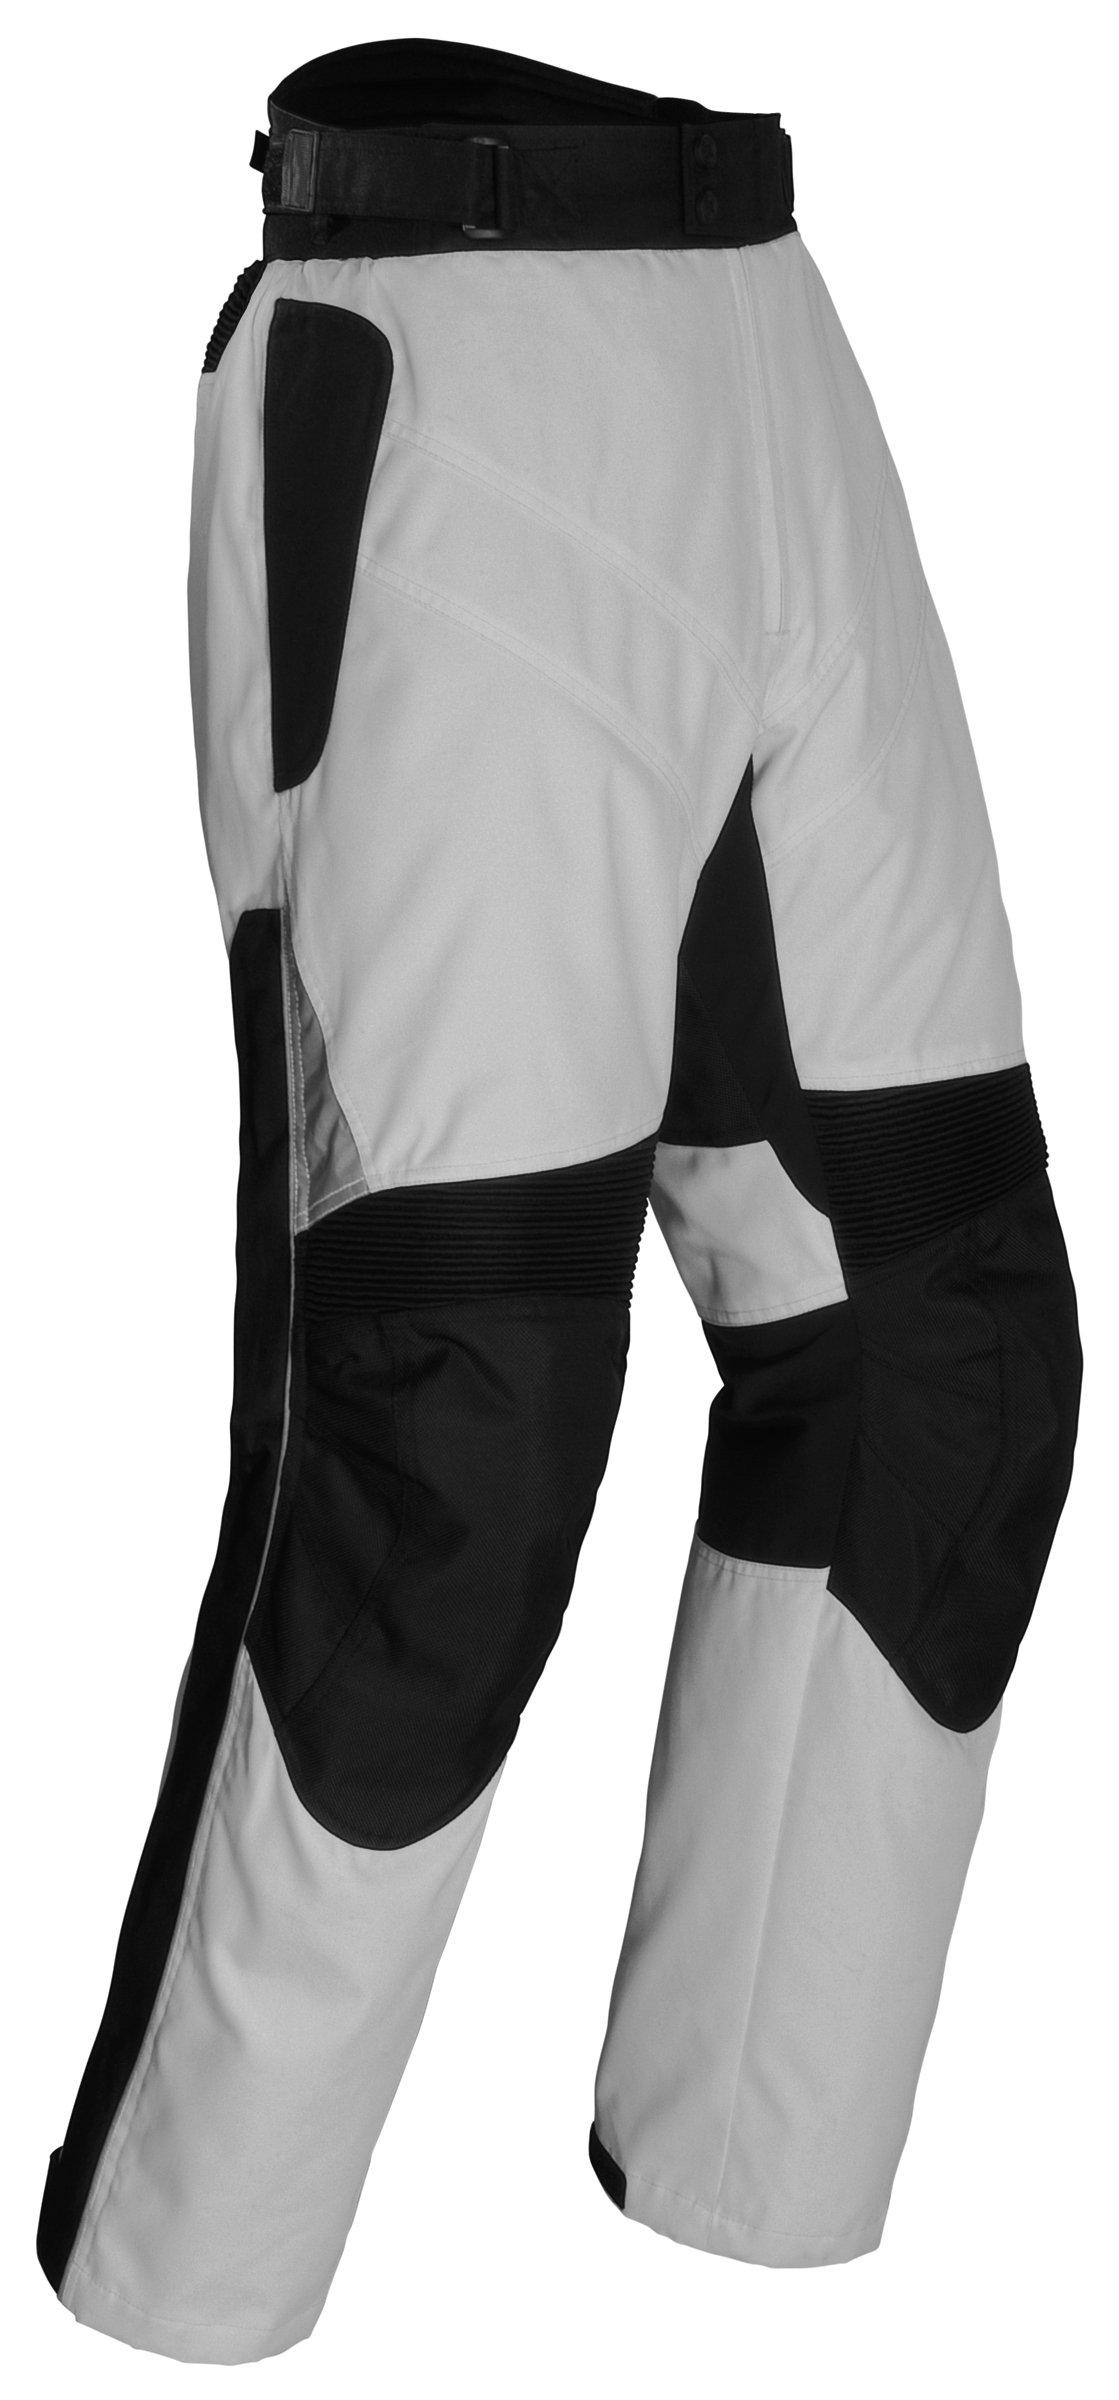 Tourmaster Mens Venture Silver/Black Pants - X-Large